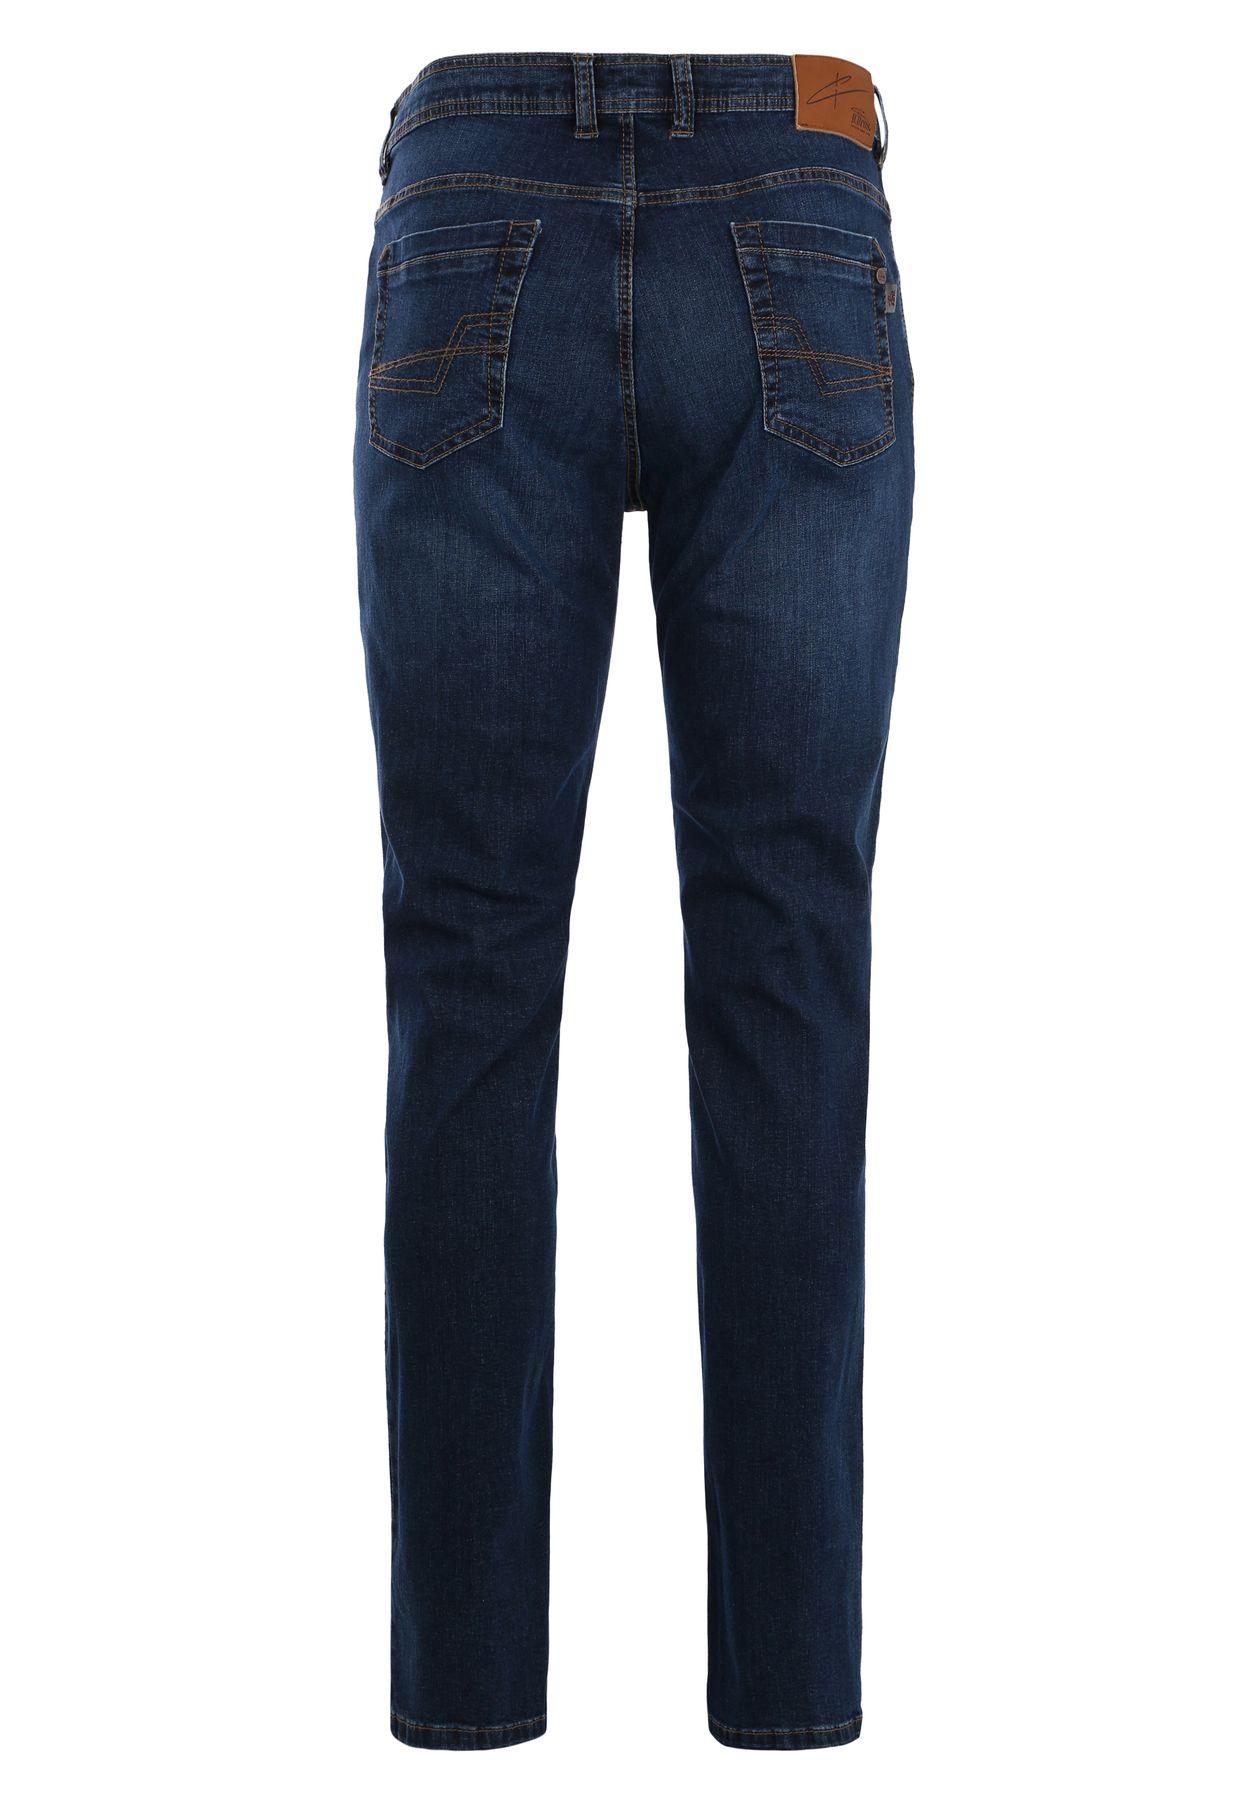 Brühl - Herren 5-Pocket Jeans in verschiedenen Farben, Toronto 2 (0614190991100) – Bild 2